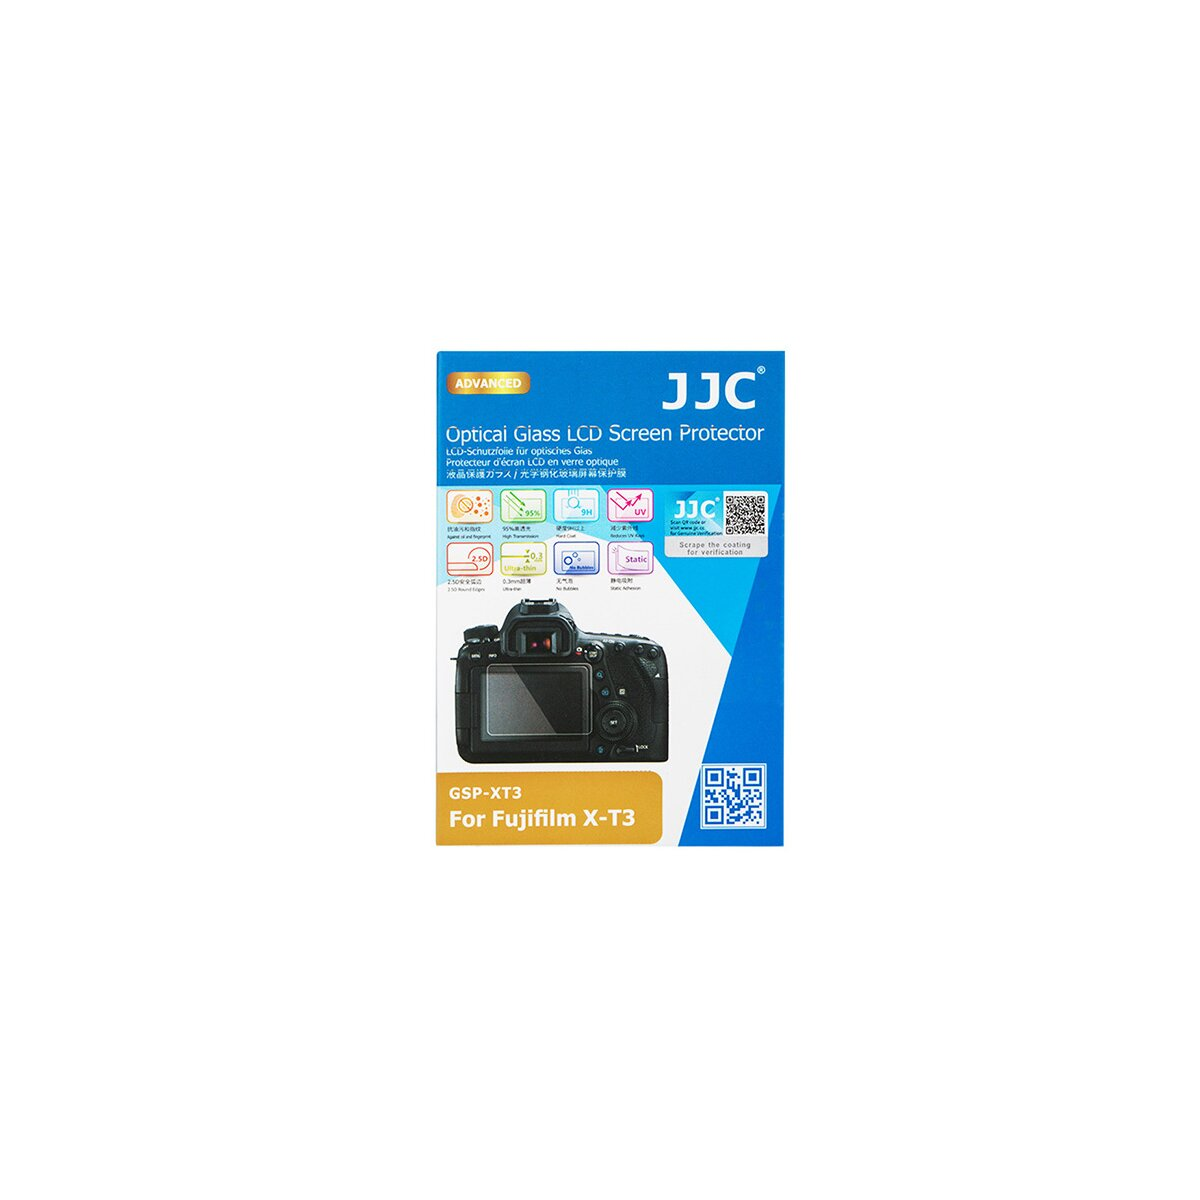 JJC Hochwertiger Displayschutz Screen Protector aus gehaertetem Echtglas, kompatibel mit Fujifilm X-T3